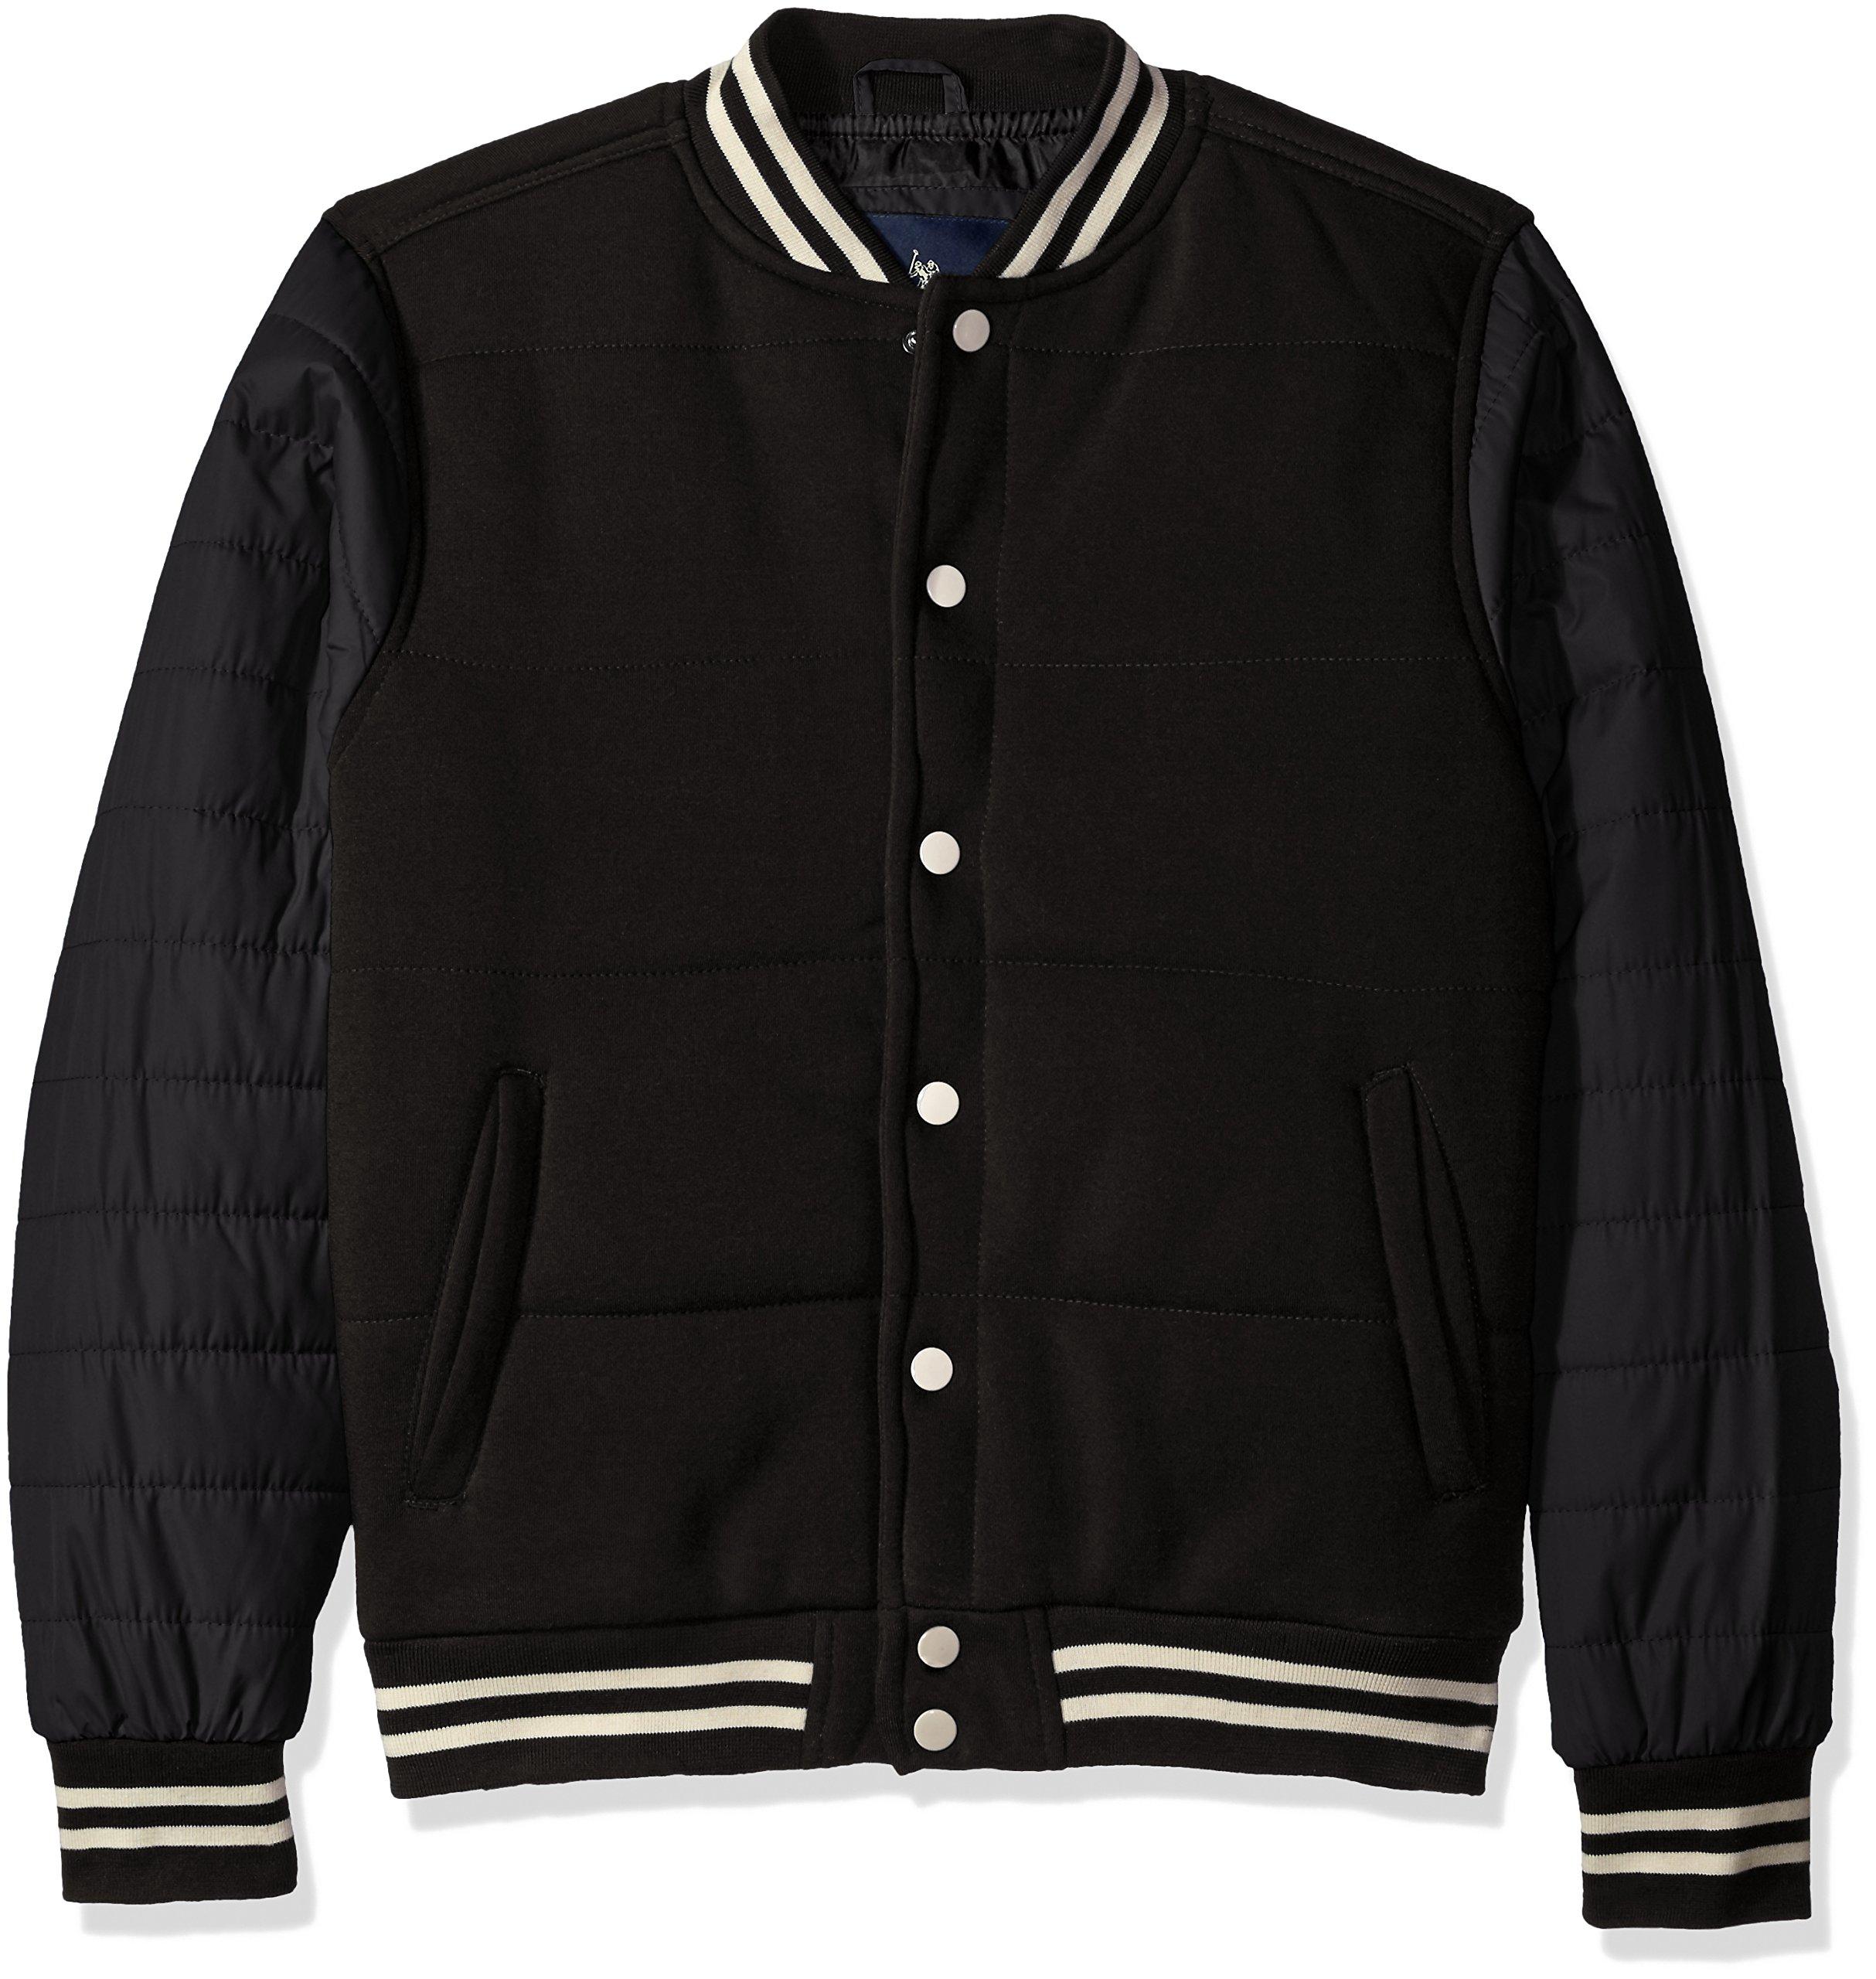 U.S. Polo Assn. Men's Baseball Fleece Jacket With Shell Sleeves, Black, L by U.S. Polo Assn.